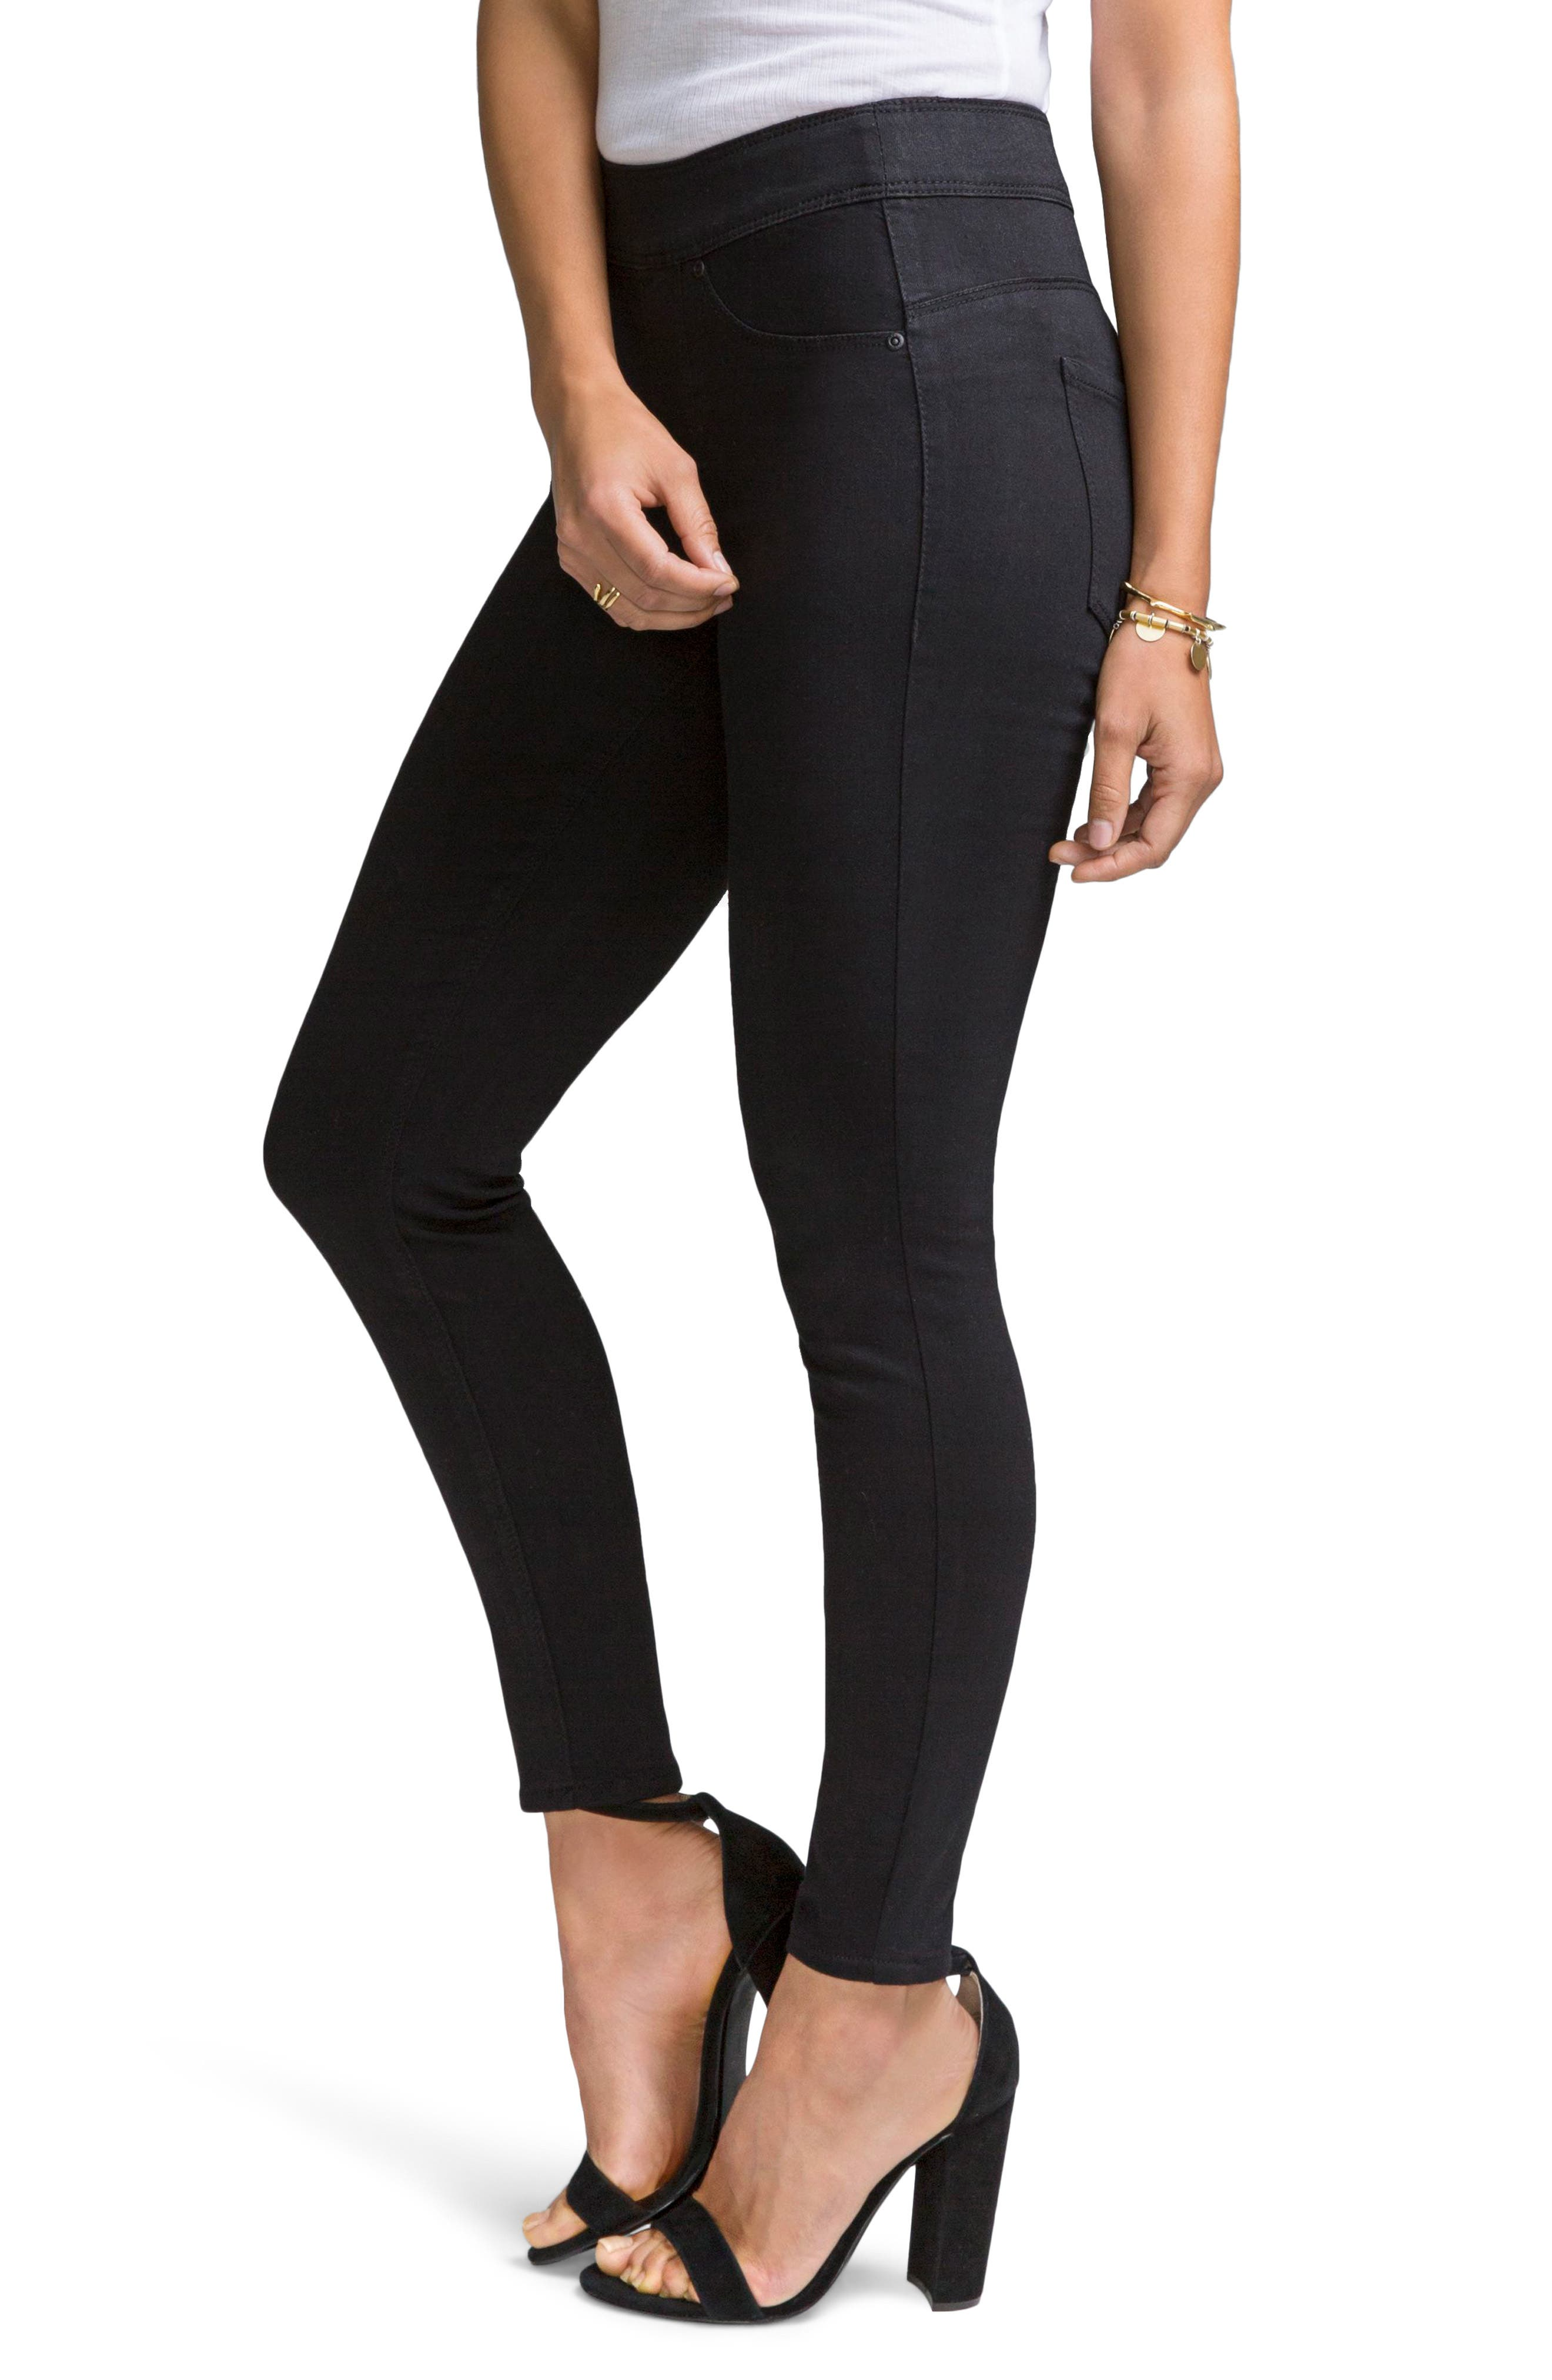 Plus Women's Curves 360 By NYDJ Sculpted Denim Leggings